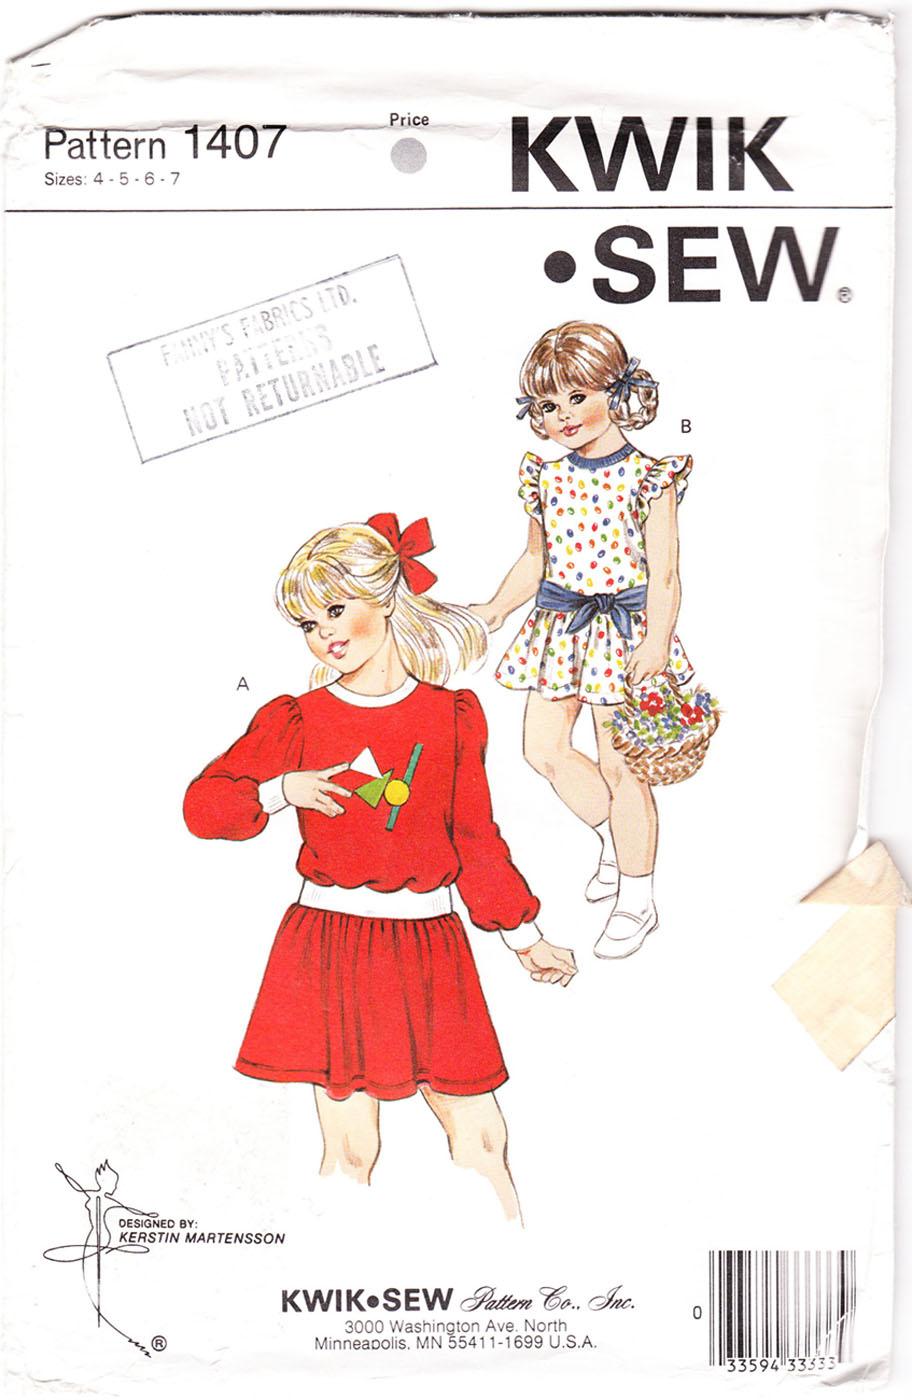 Kwik Sew 1407